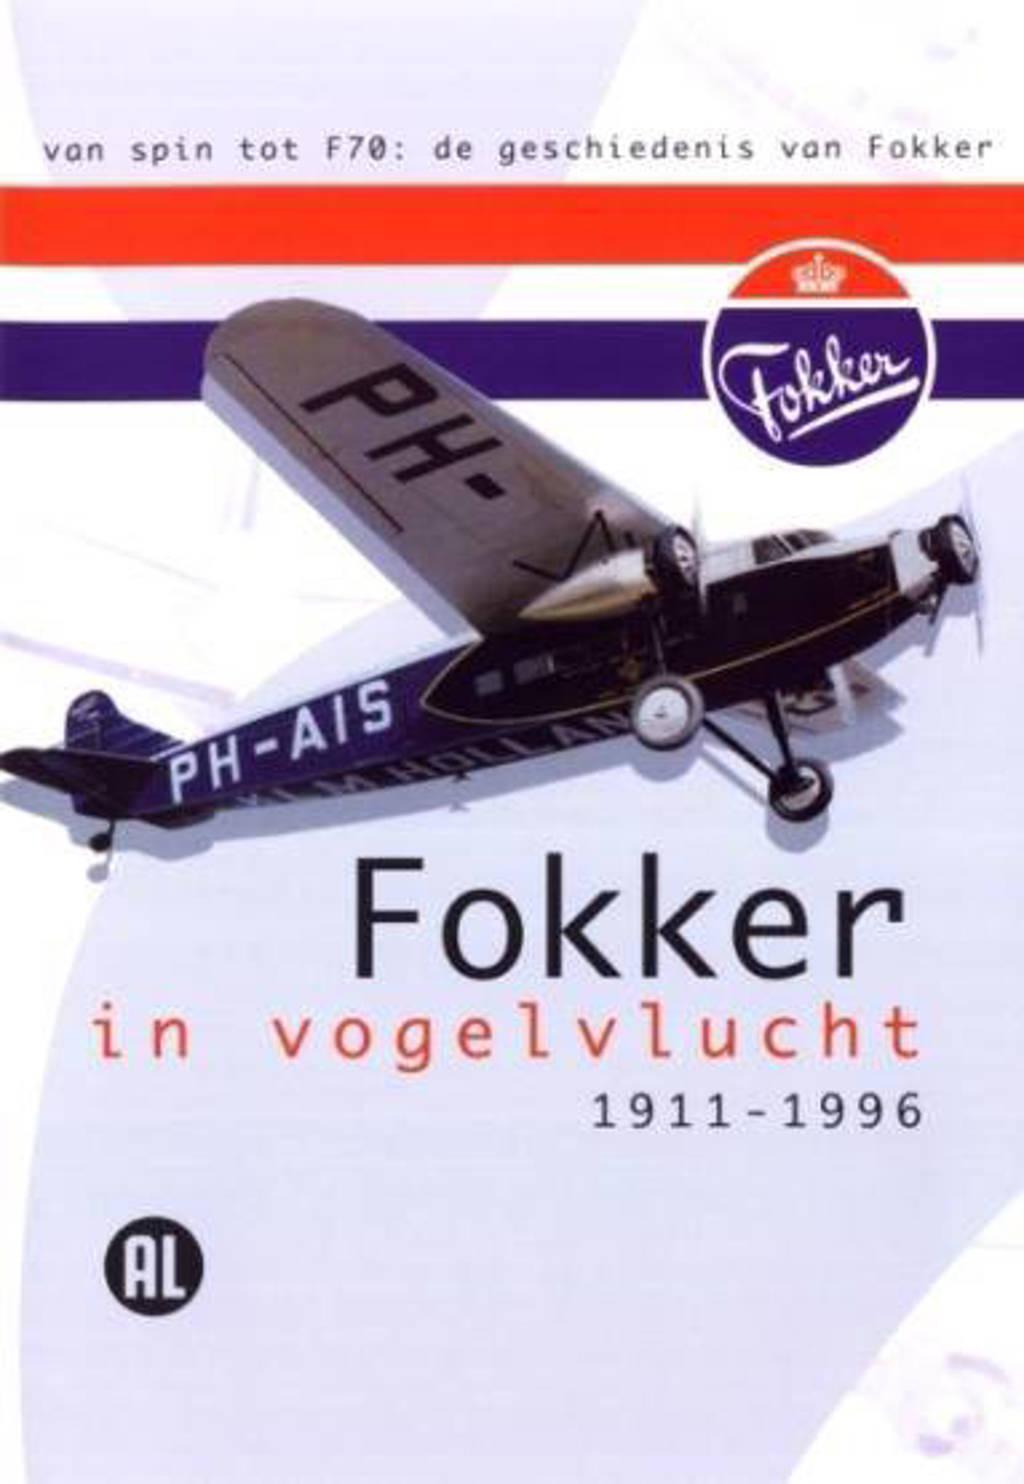 Fokker in vogelvlucht 1911-1996 (DVD)